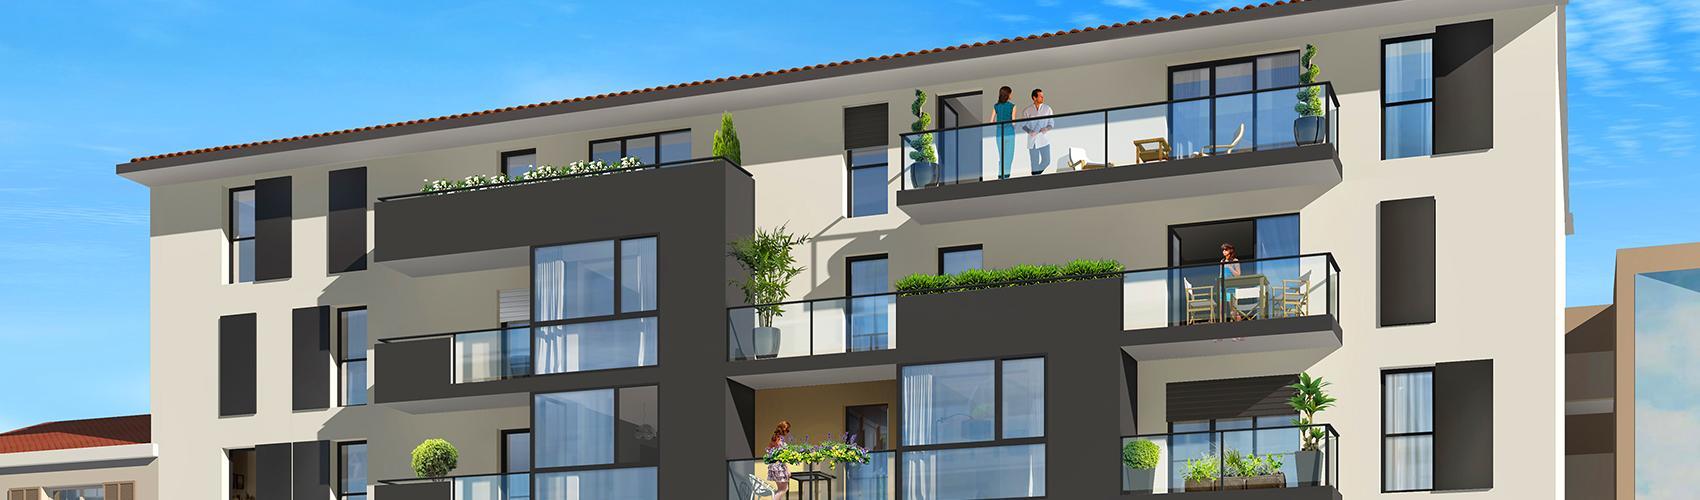 Photo du programme immobilier neuf NIC-778 à Nice